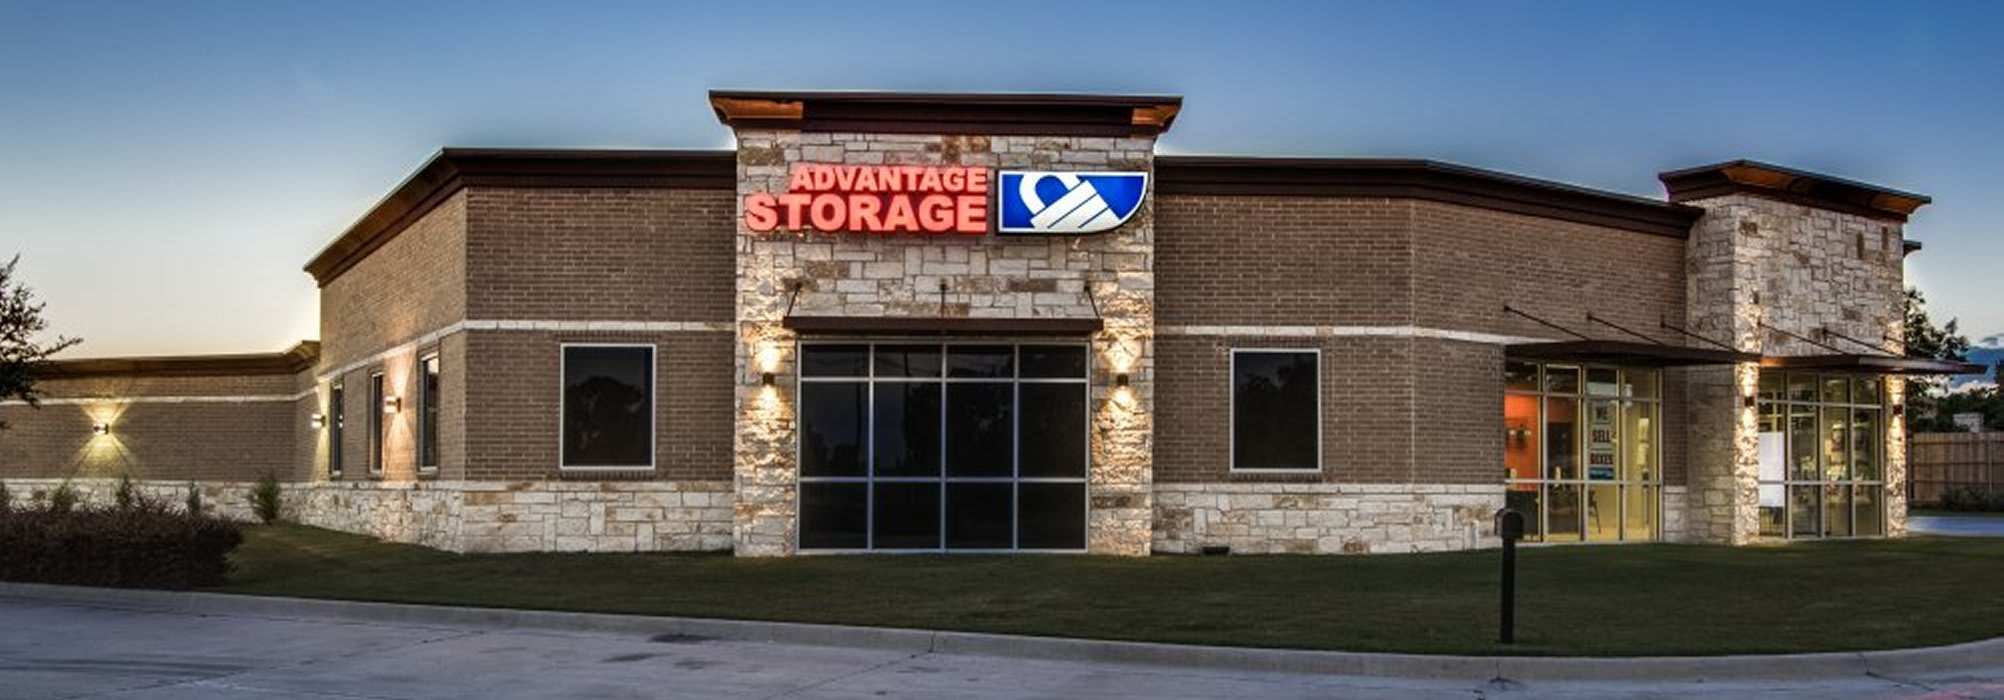 Self storage in Rowlett TX